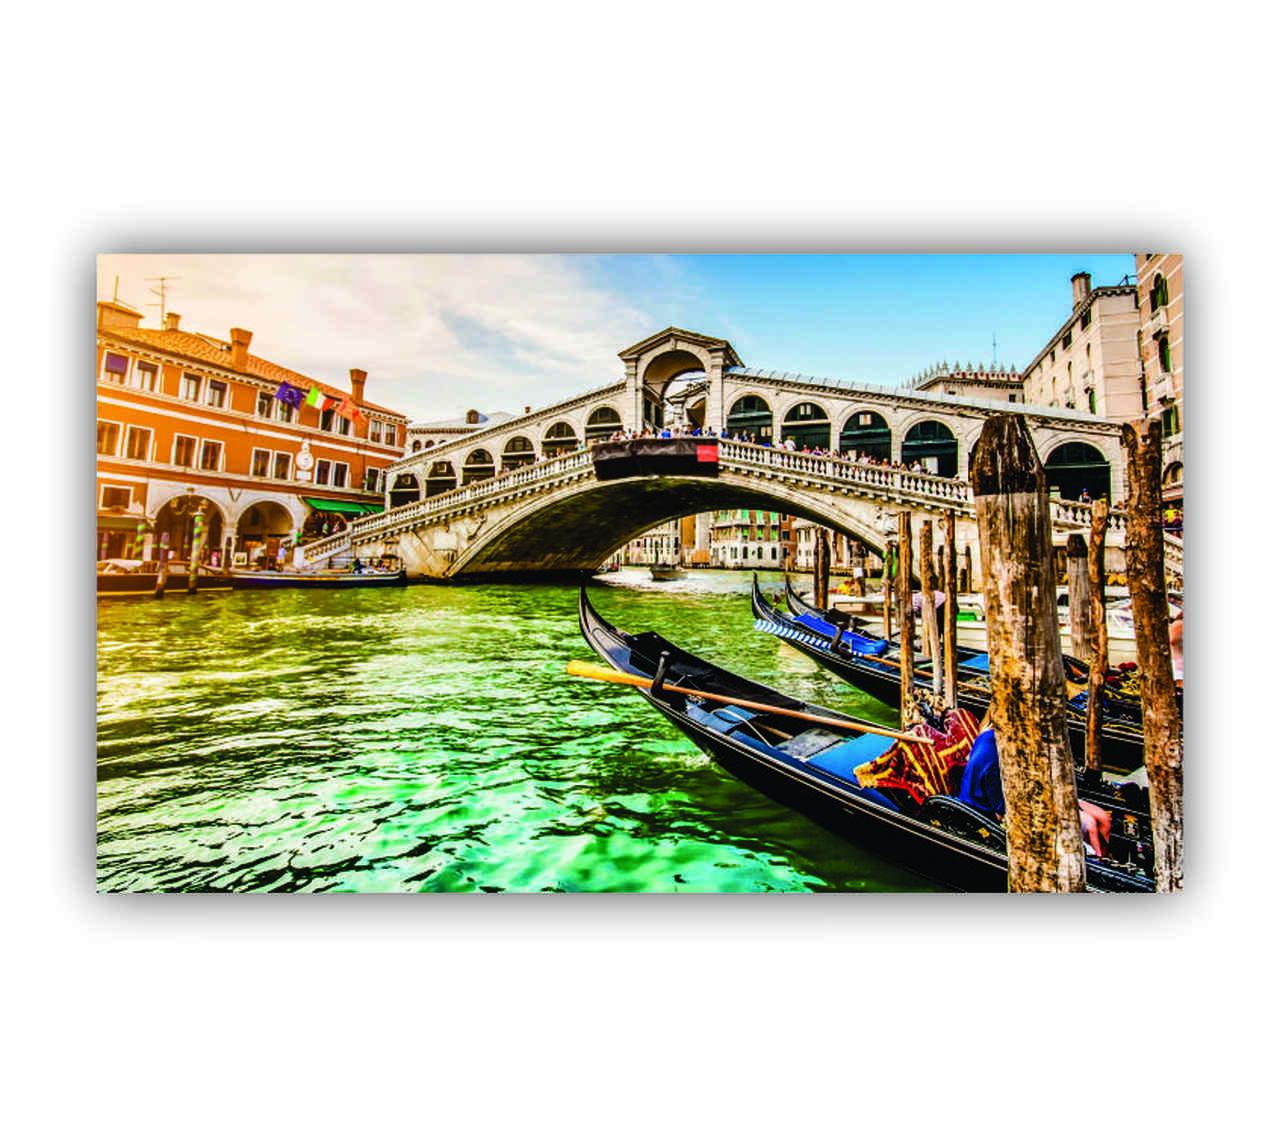 Quadro Veneza - Tela Única